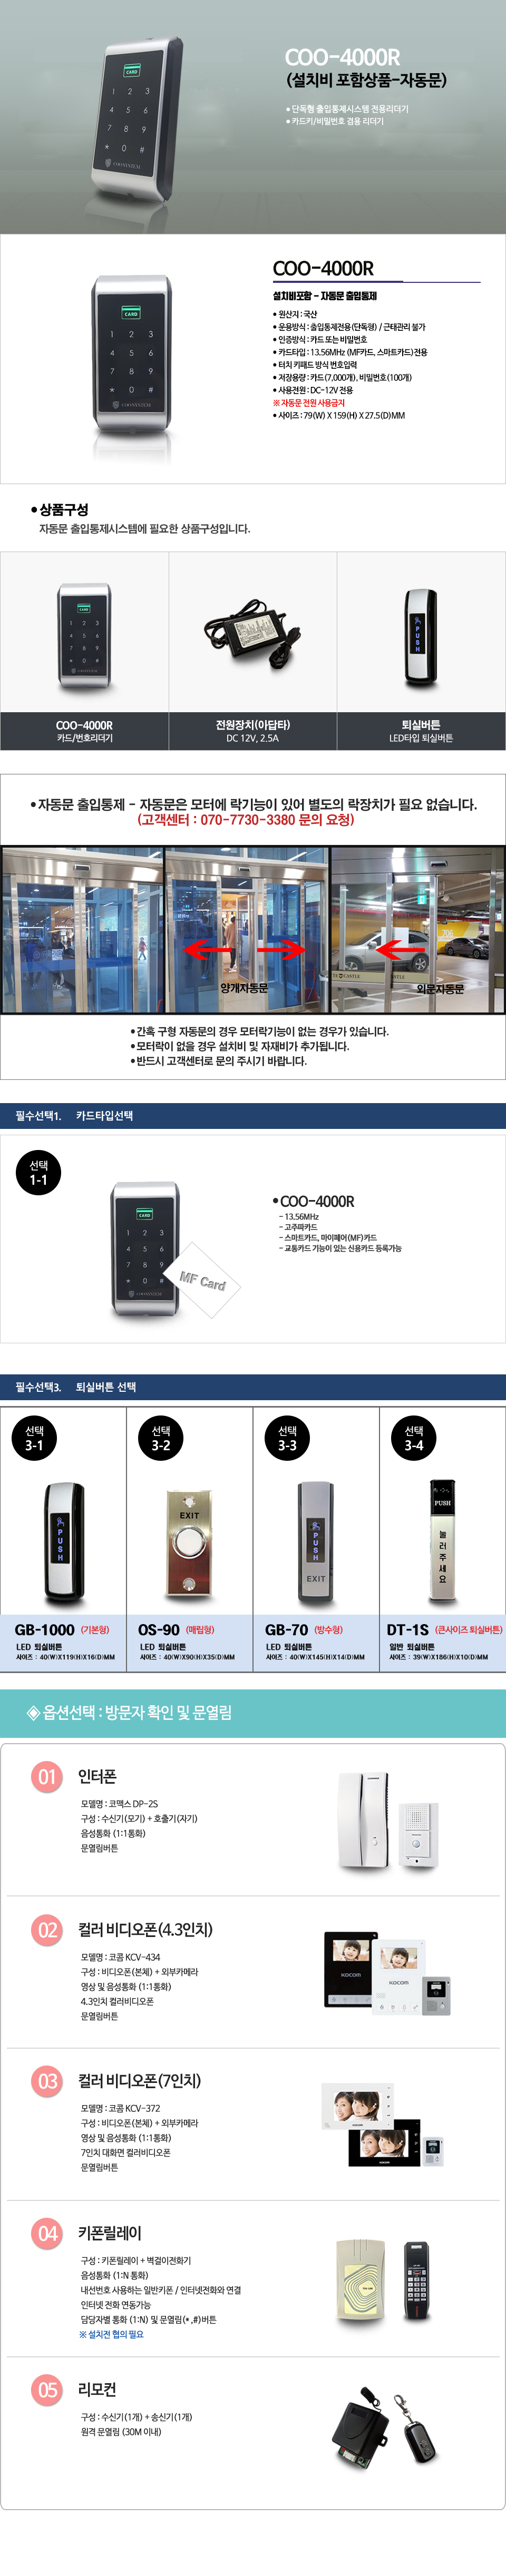 COO-4000R설치비포함작업-자동문.jpg